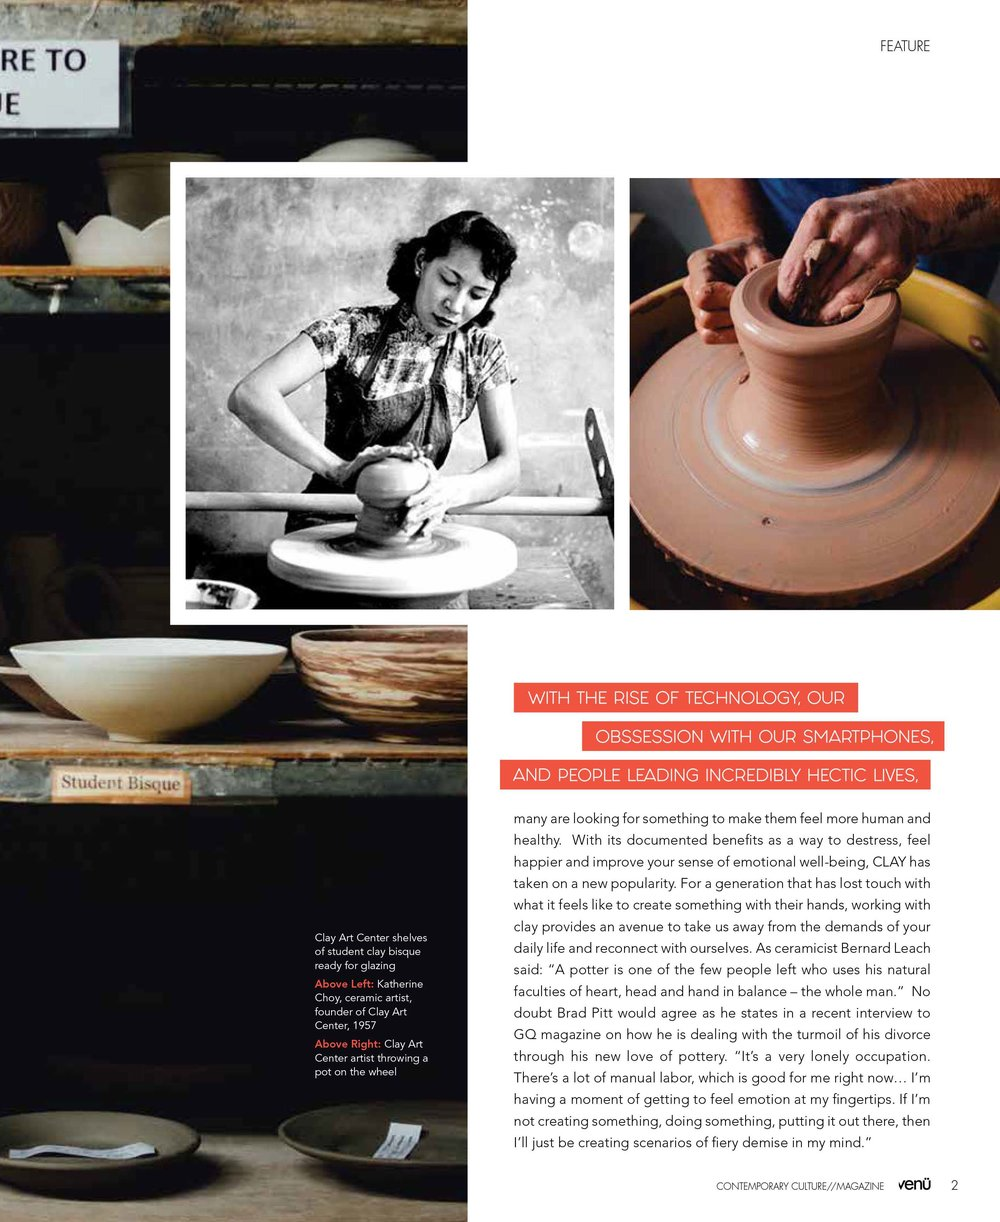 Clay Art Center Venu Magazine Feature Fall 2017-page 2.jpg